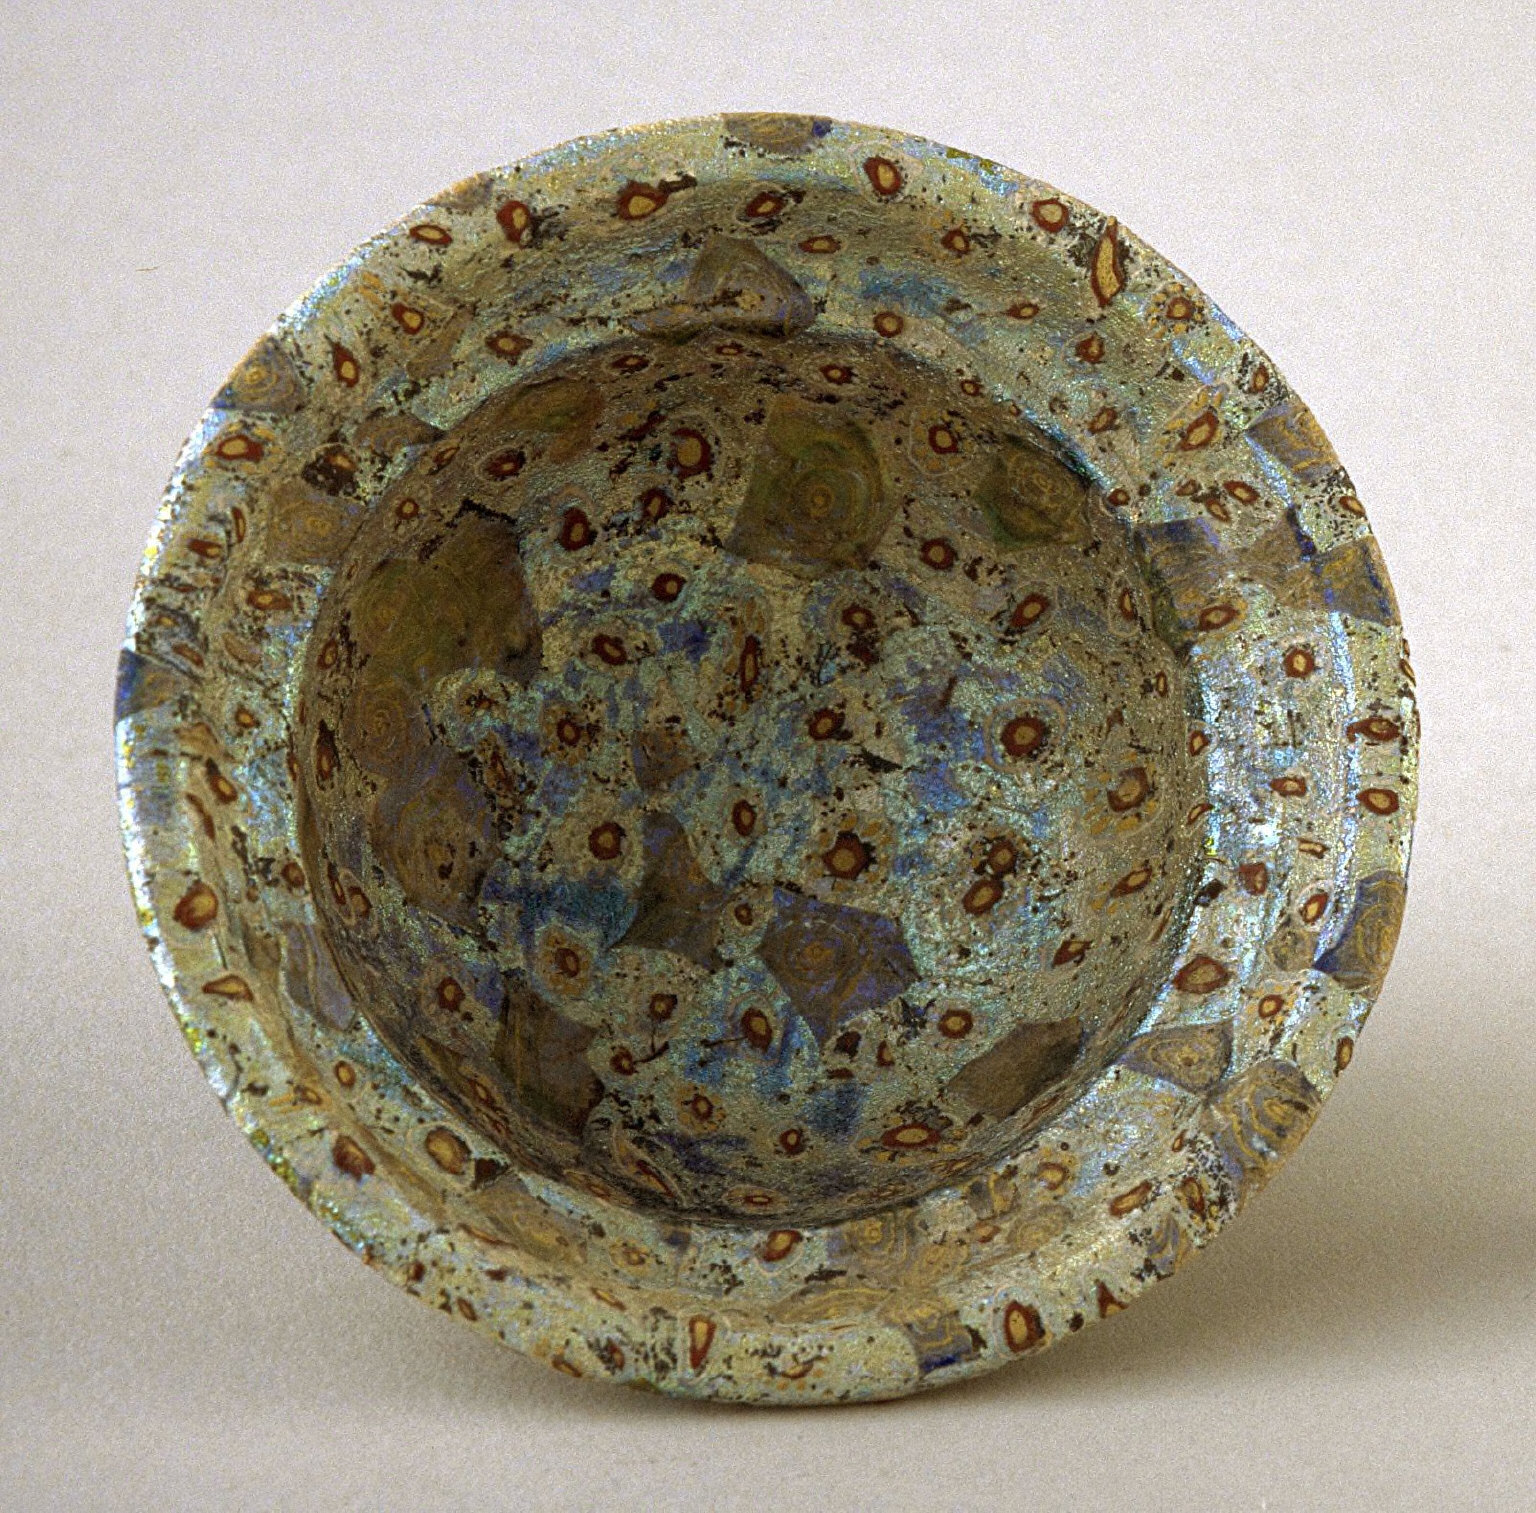 Patella cup